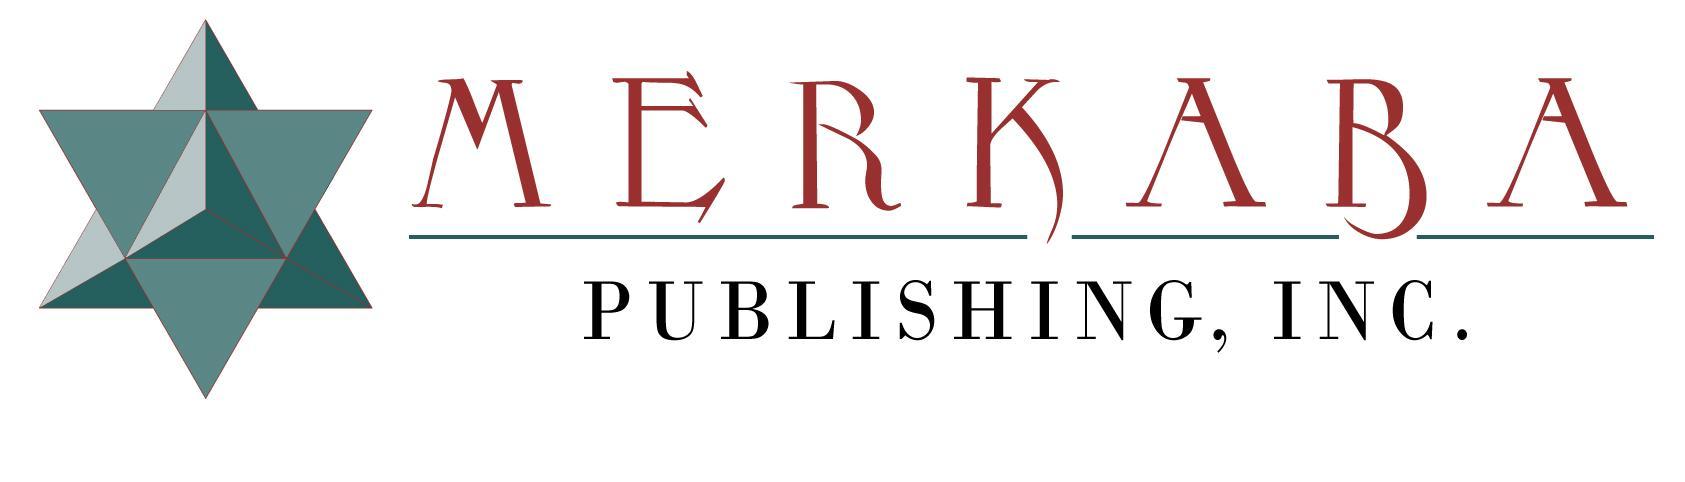 MERKABA Publishing LOGO